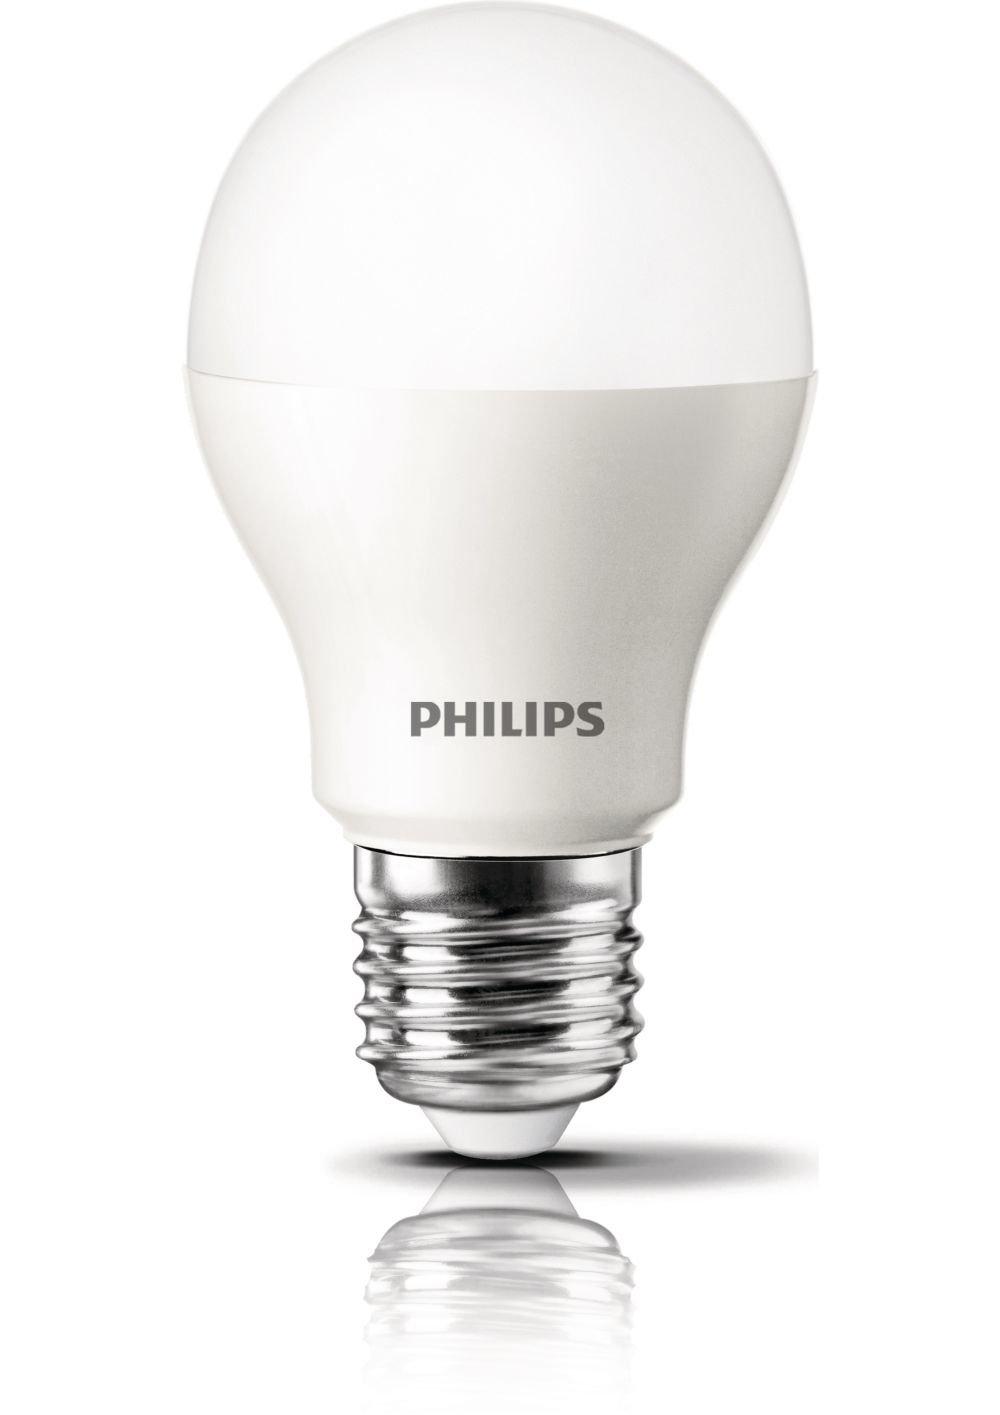 Philips led lampe ersetzt 32 w e27 sockel 2700 kelvin warmwei philips led lampe ersetzt 32 w e27 sockel 2700 kelvin warmwei 6 w 350 lumen amazon beleuchtung parisarafo Images